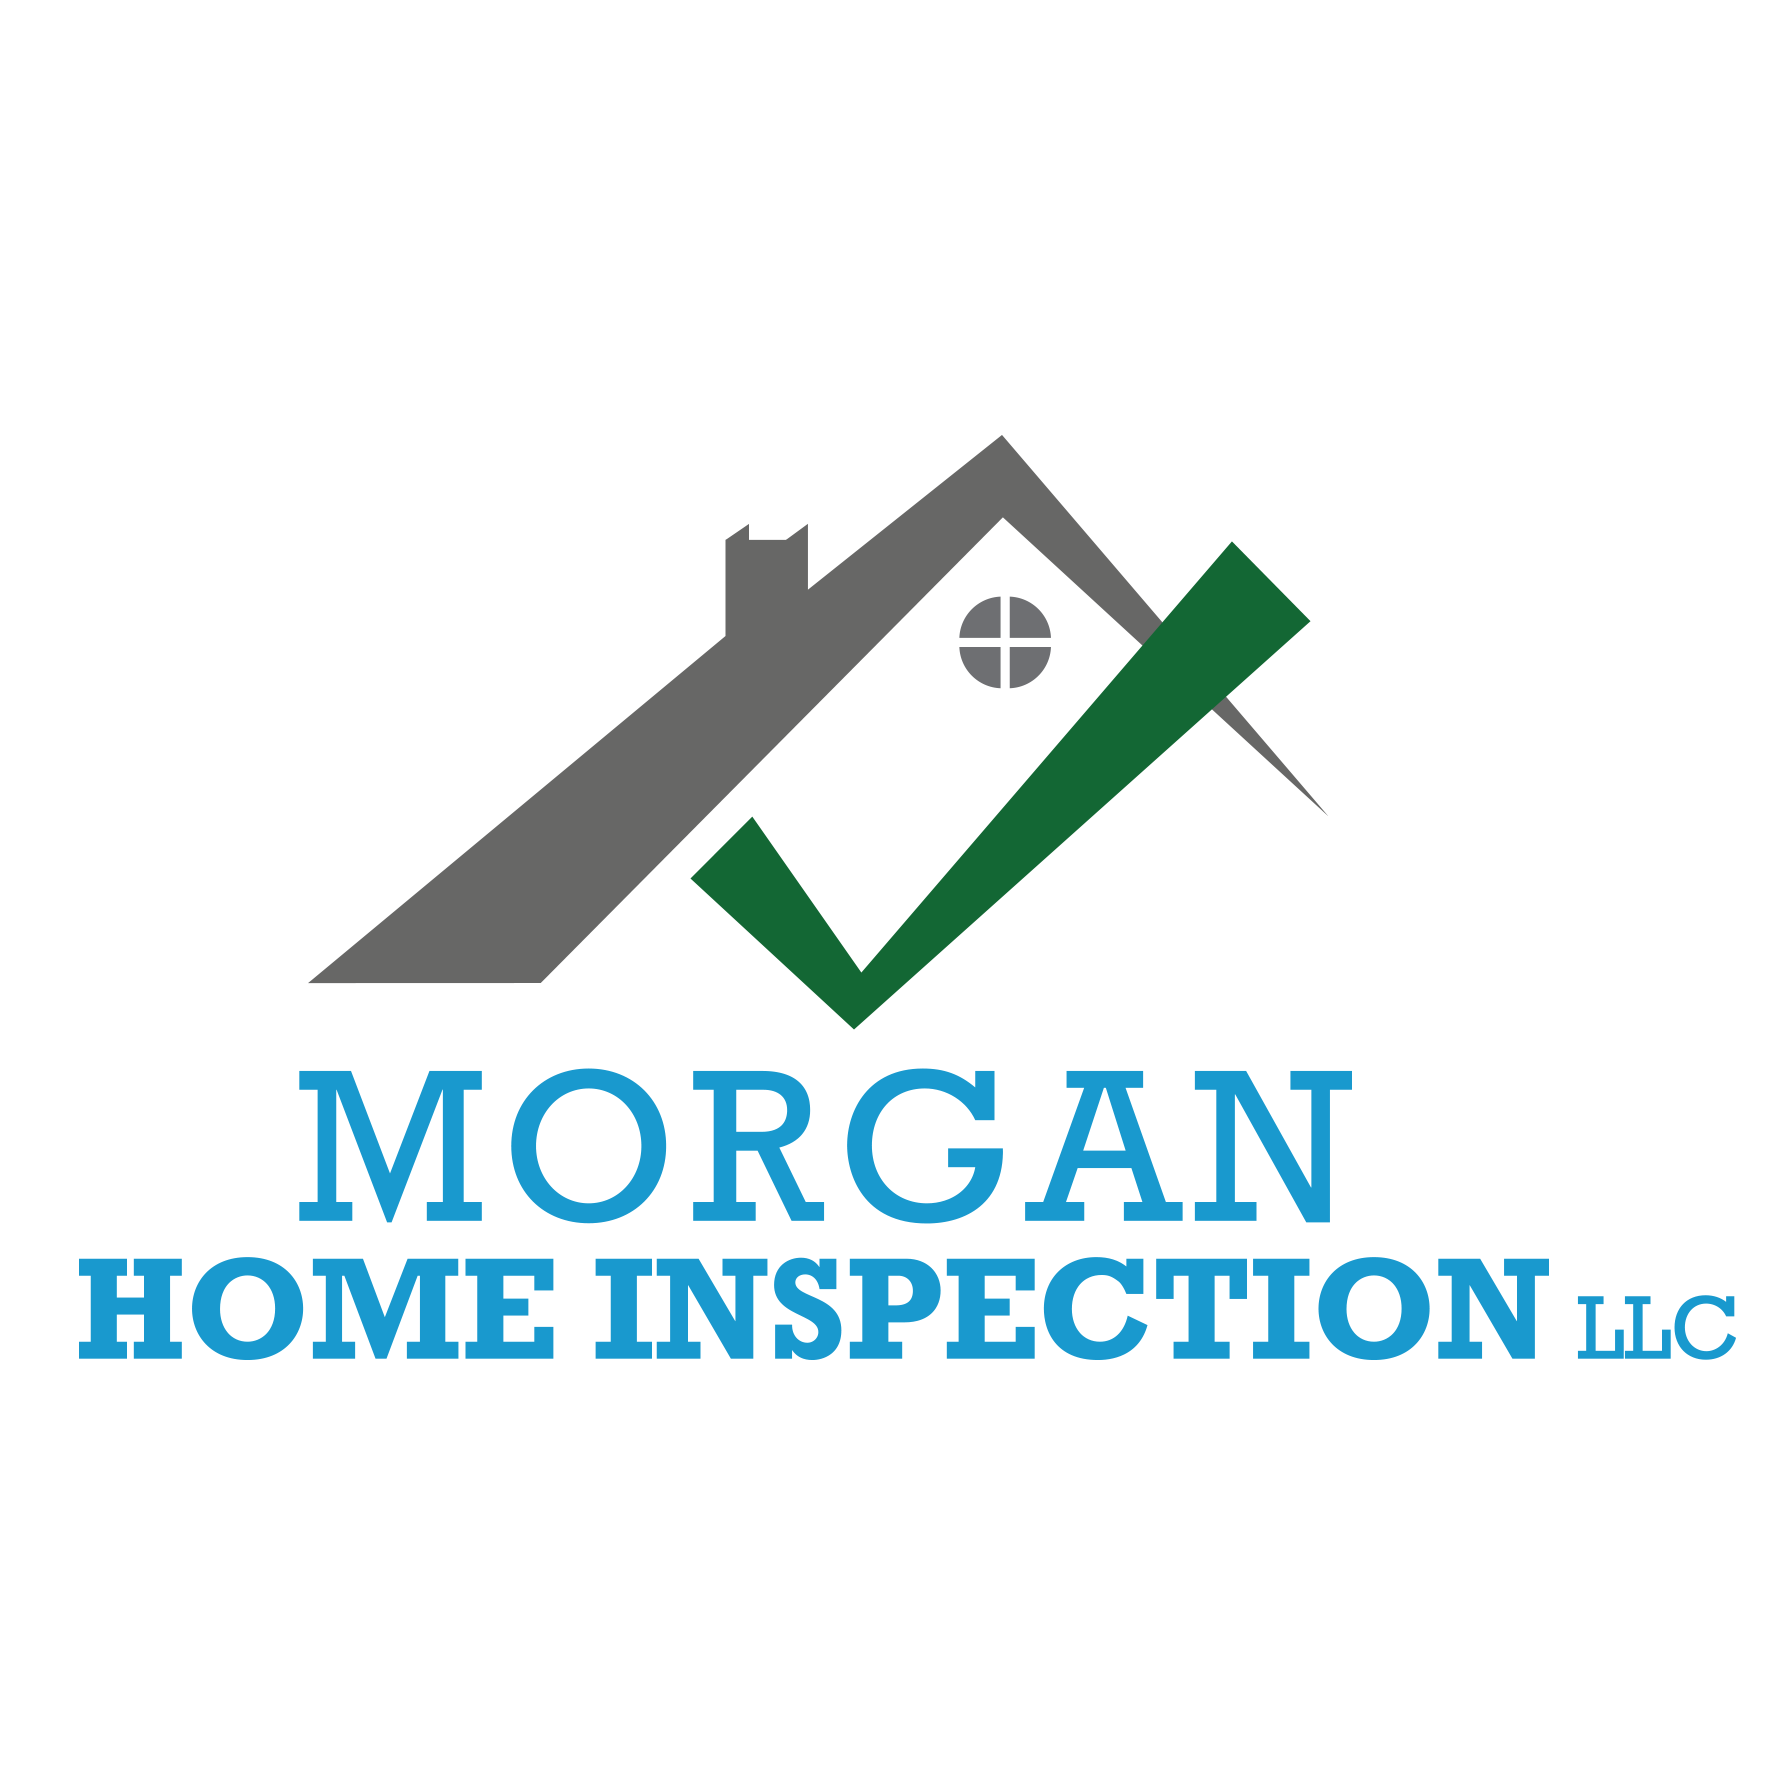 Morgan Home Inspection, LLC